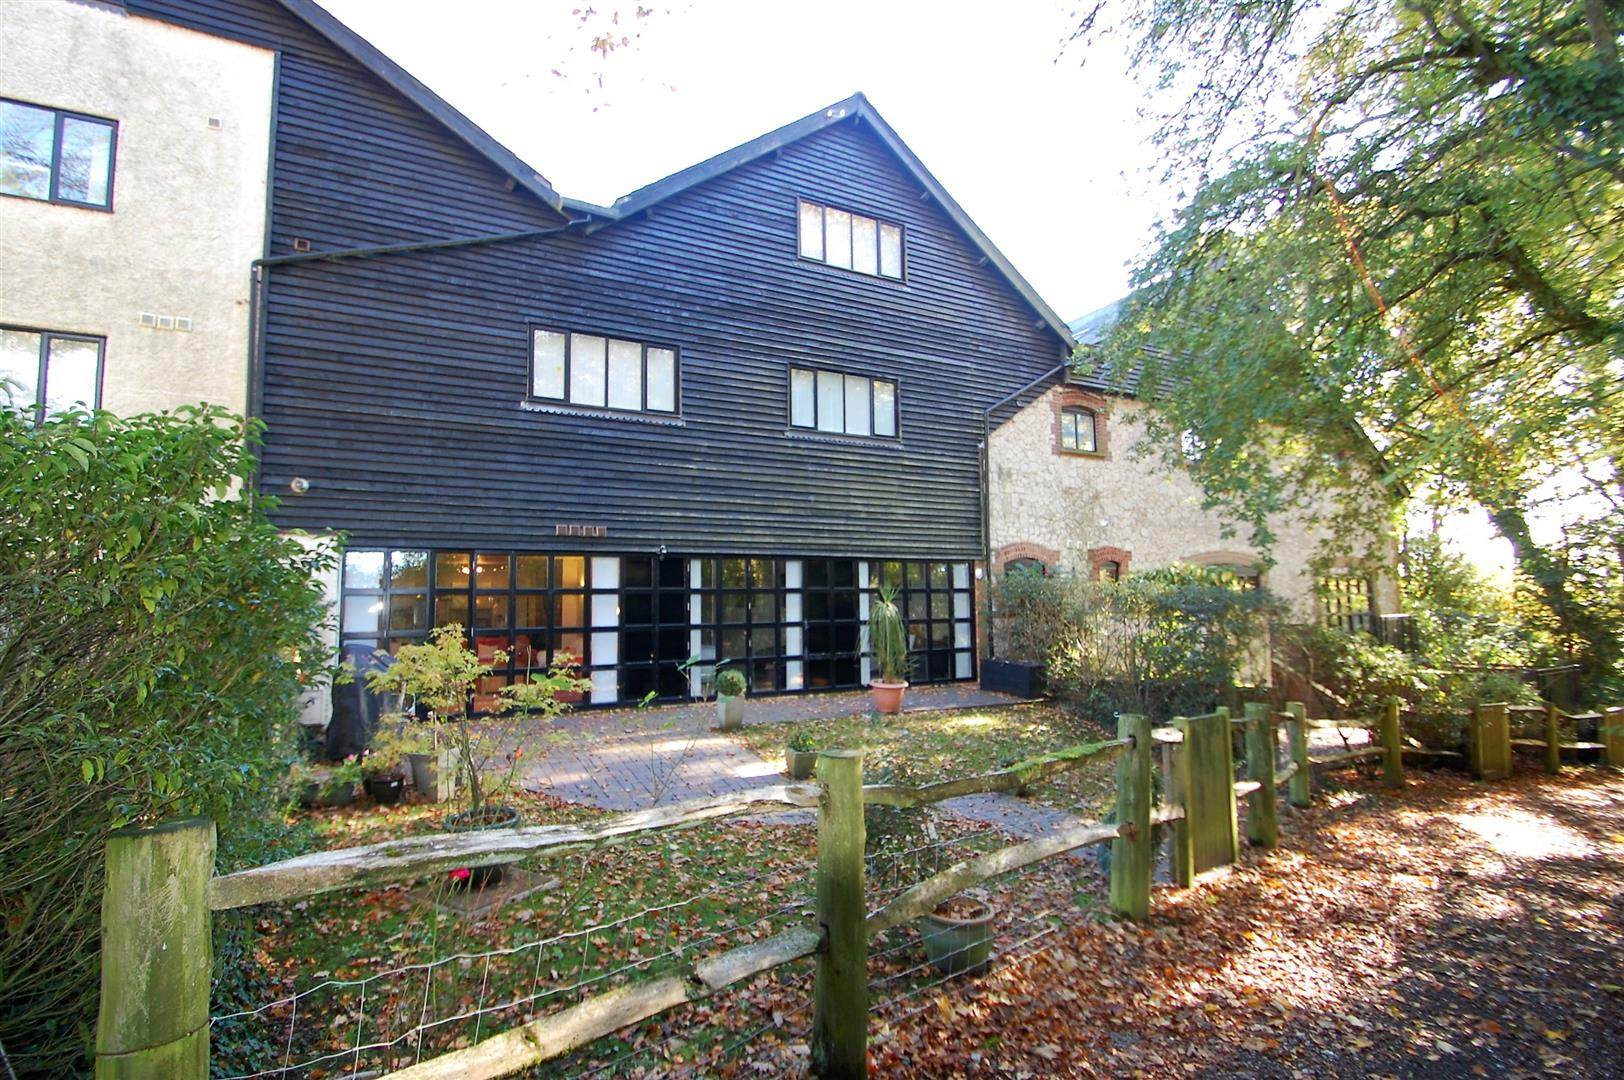 The Kiln, Selborne